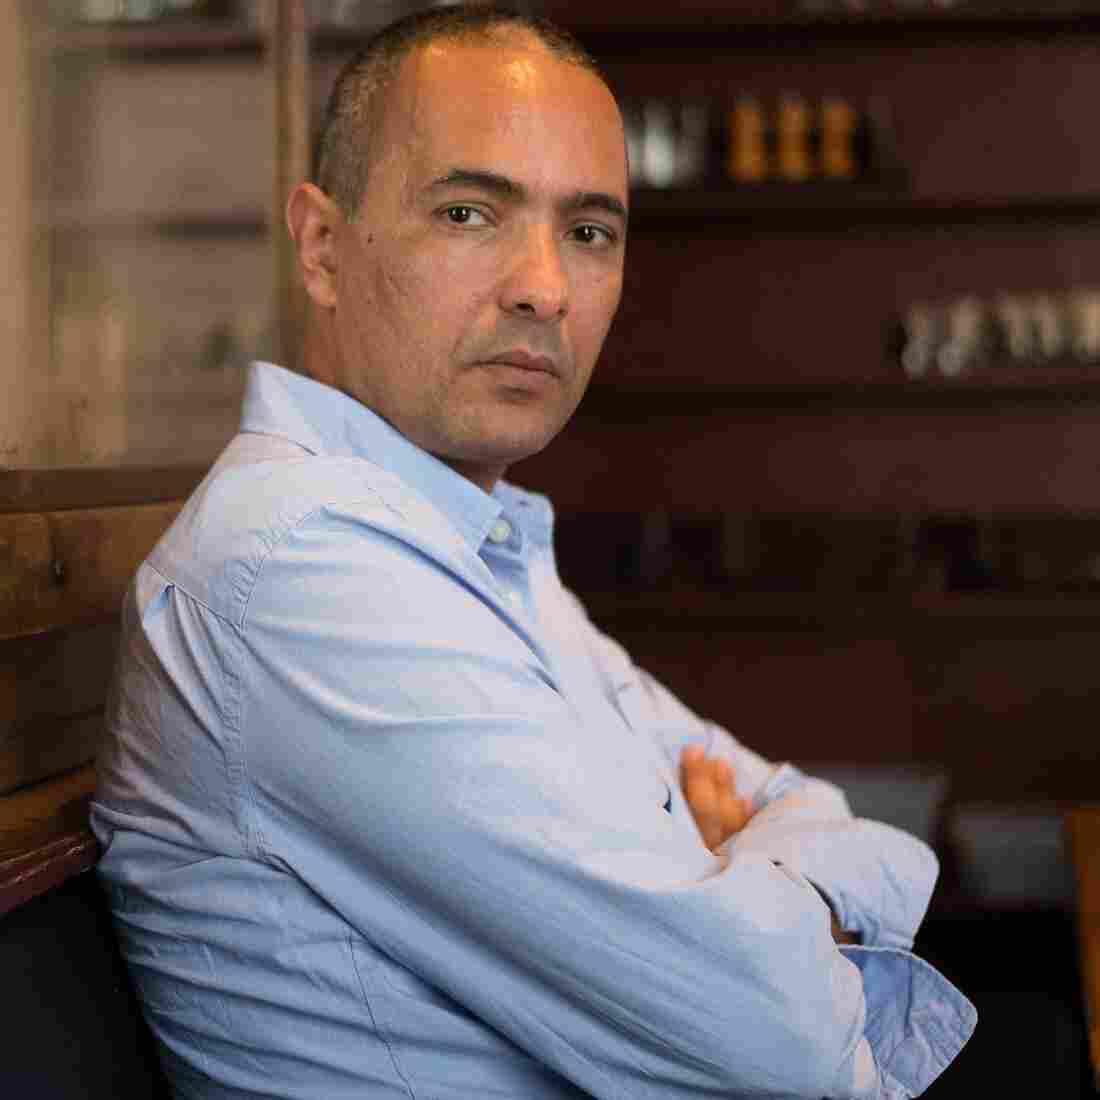 Novelist Kamel Daoud, Finding Dignity In The Absurd